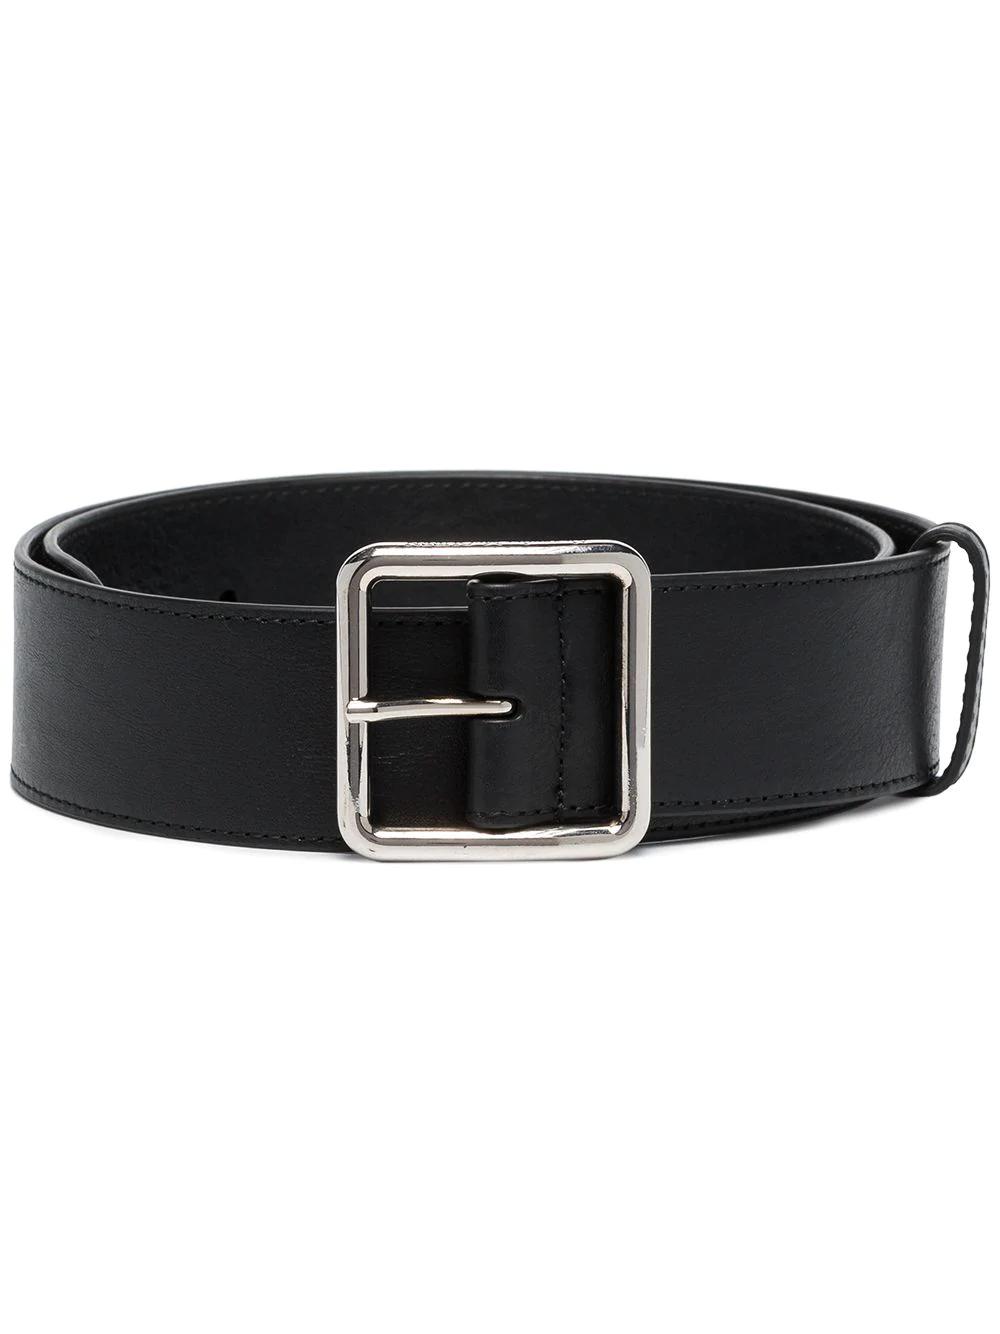 Alexander Mcqueen Leather Belt Farfetch Alexander Mcqueen Belt Leather Belt